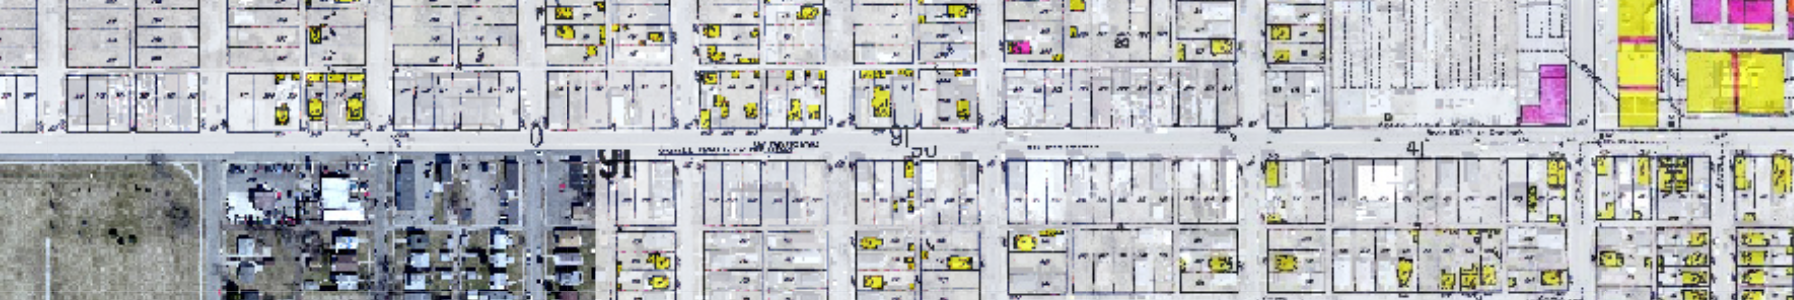 1917 map of Western Avenue.